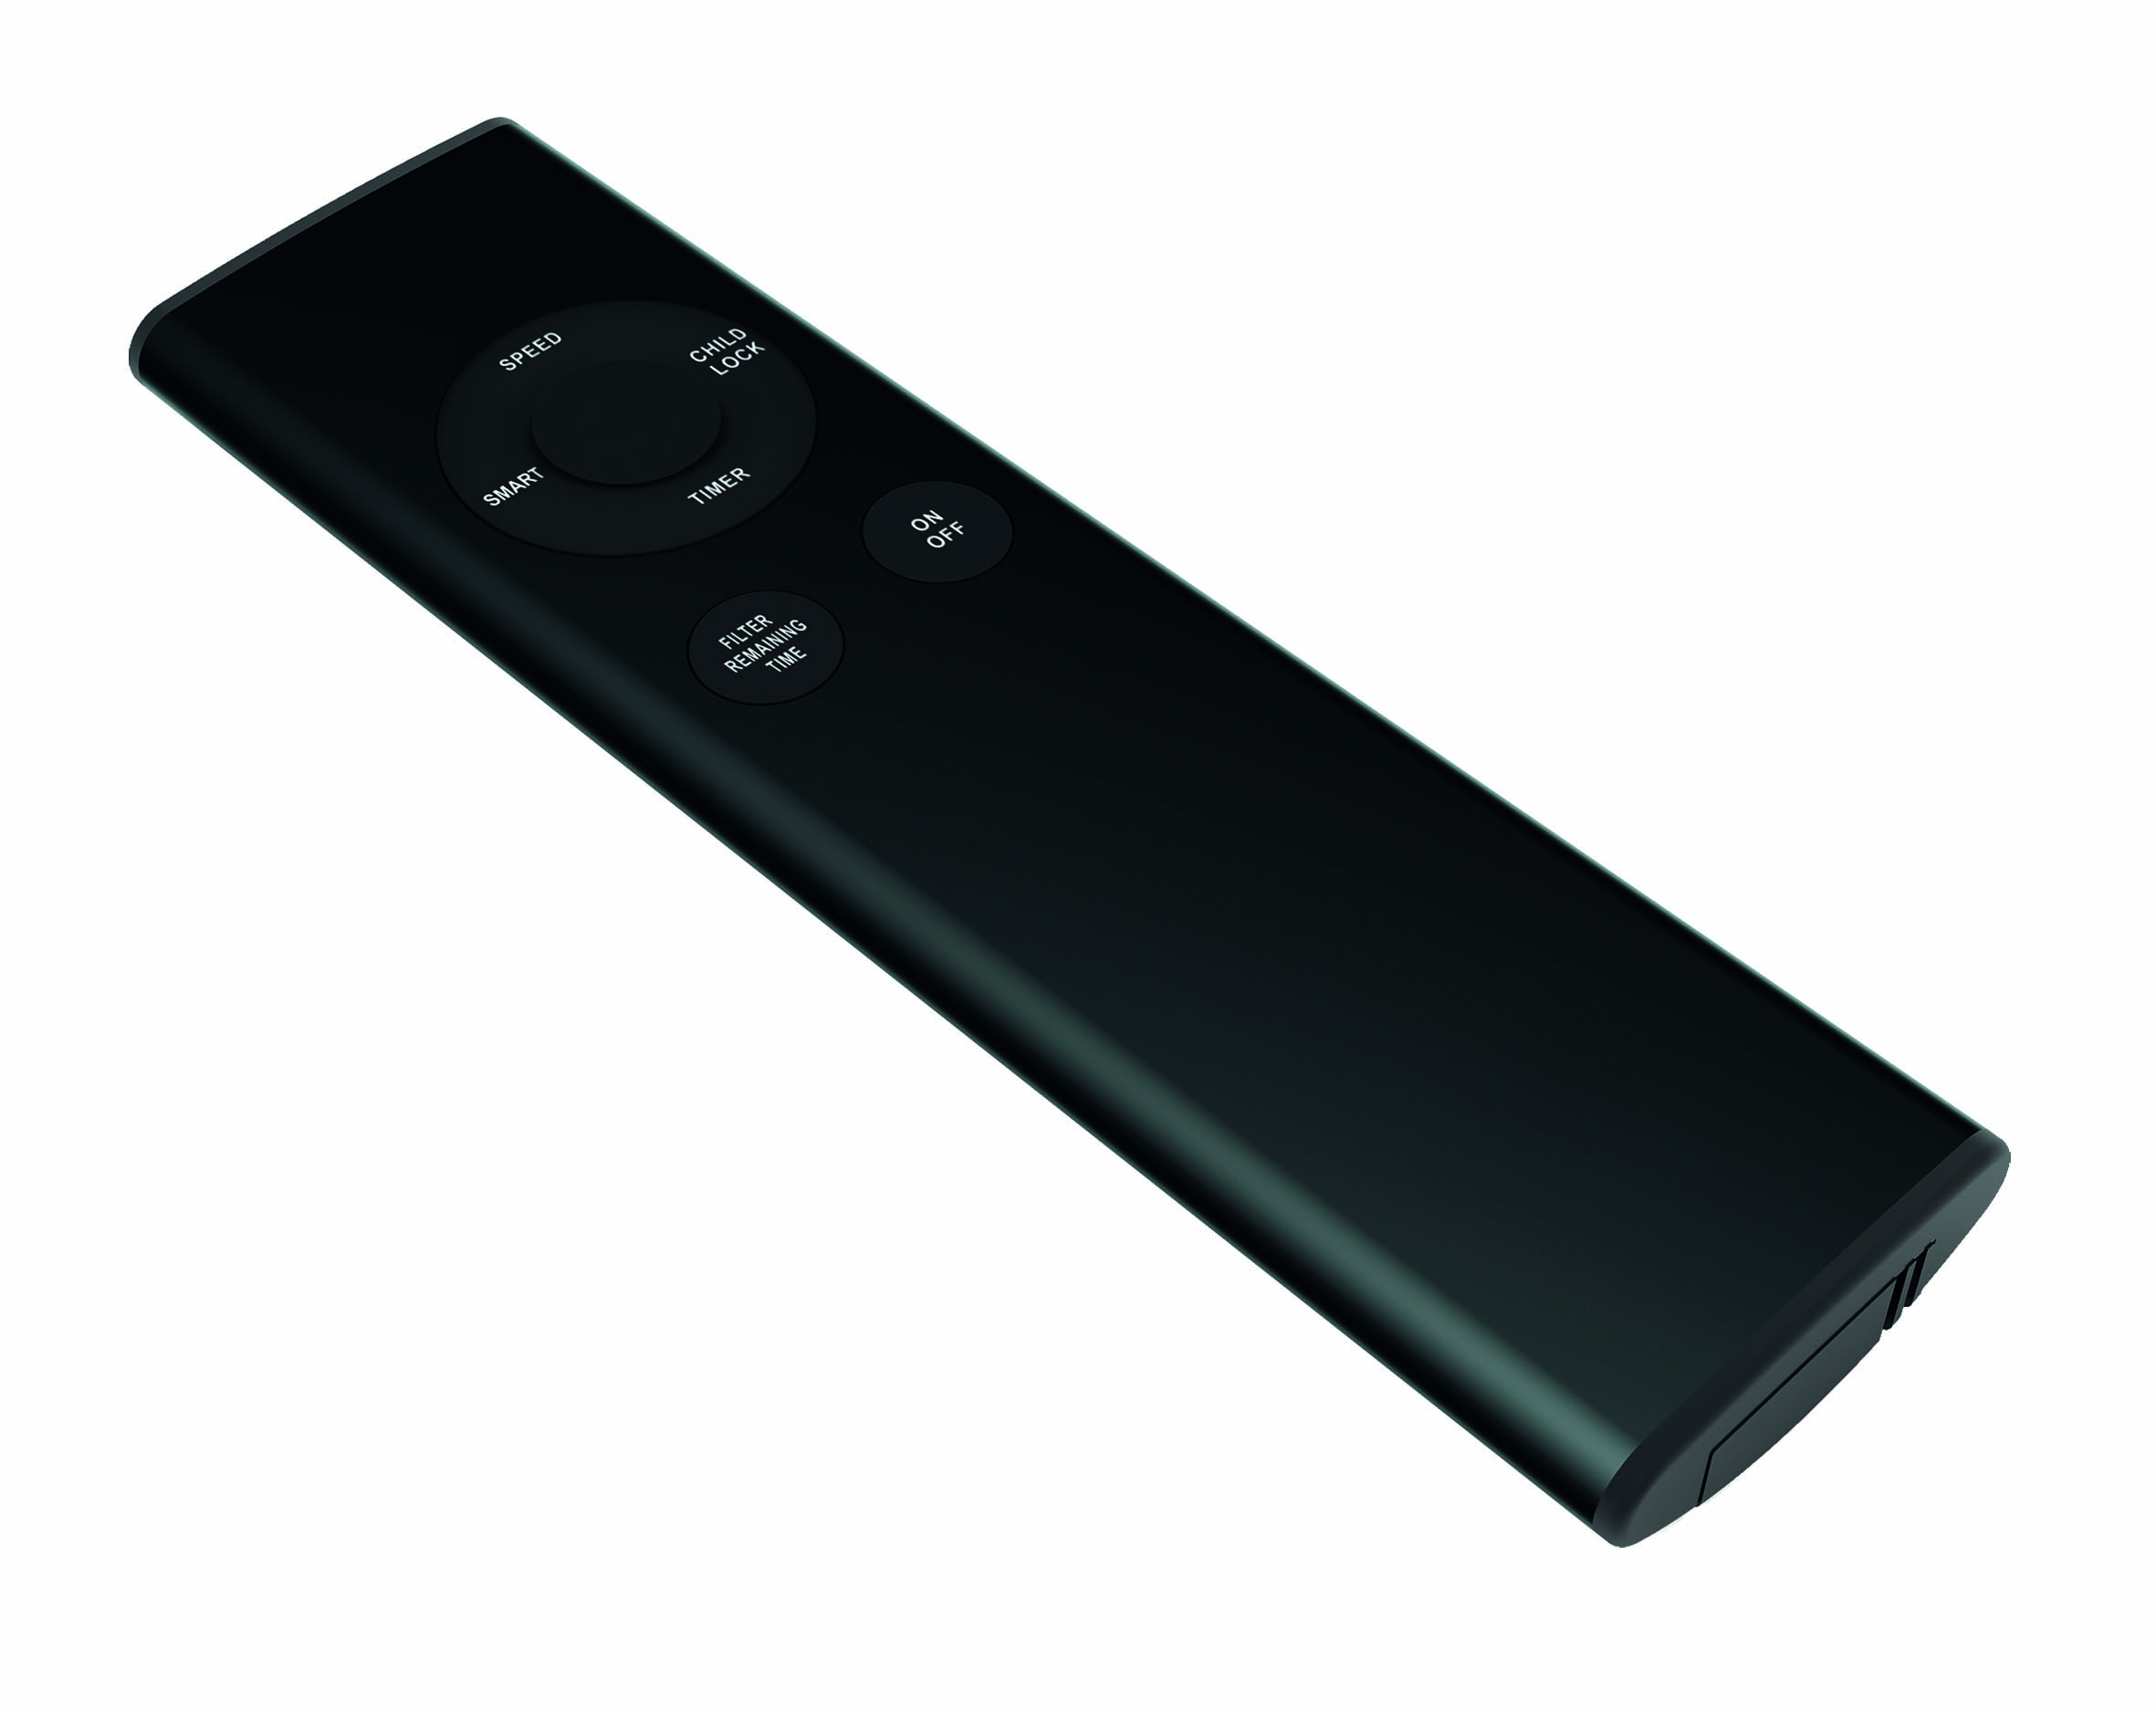 AirX Pro Range Remote Control.